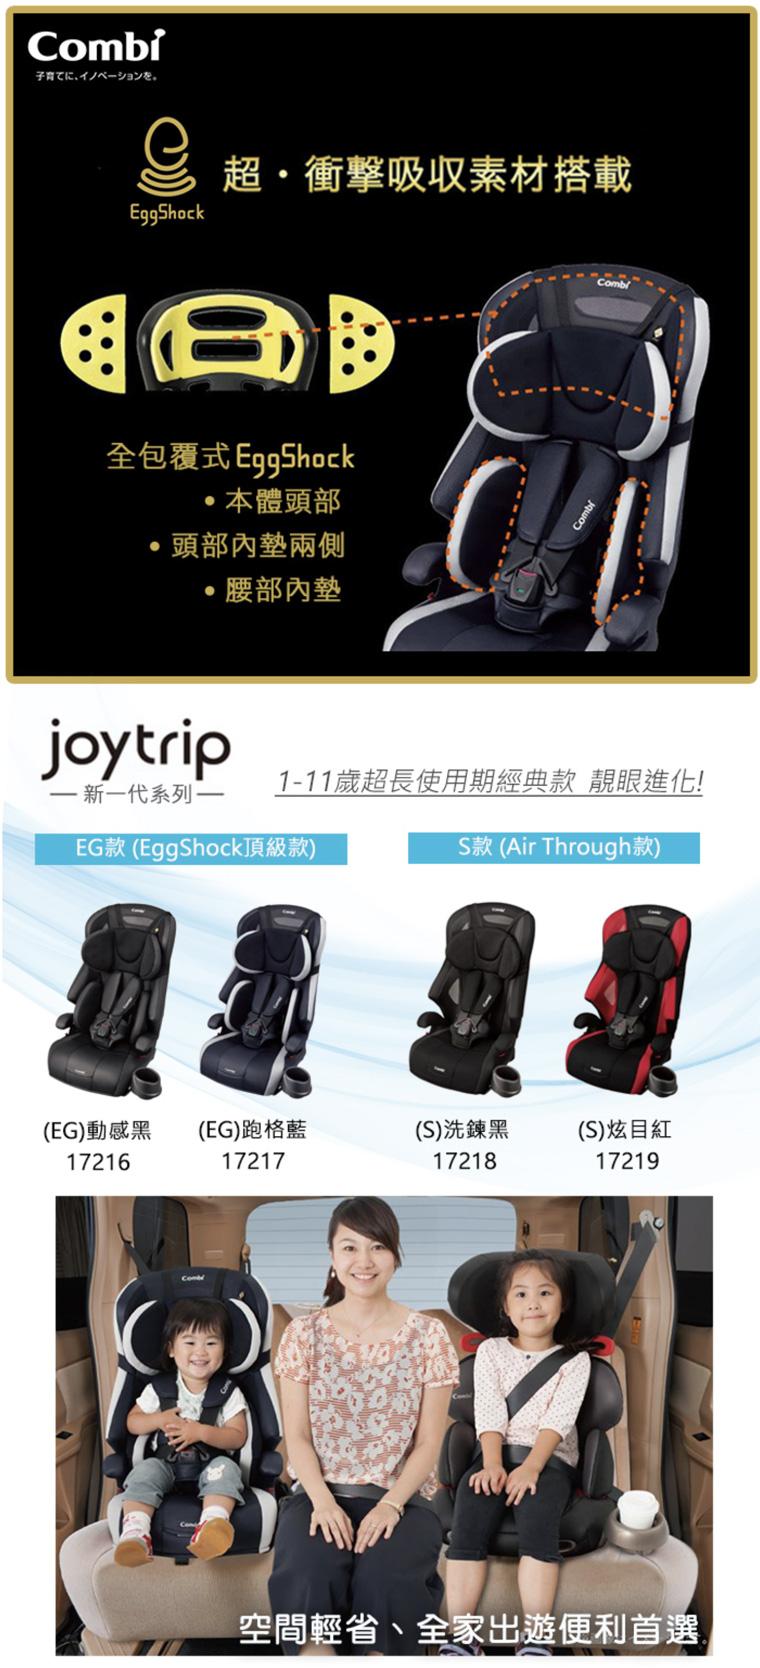 combi-joytrip-2019-info01